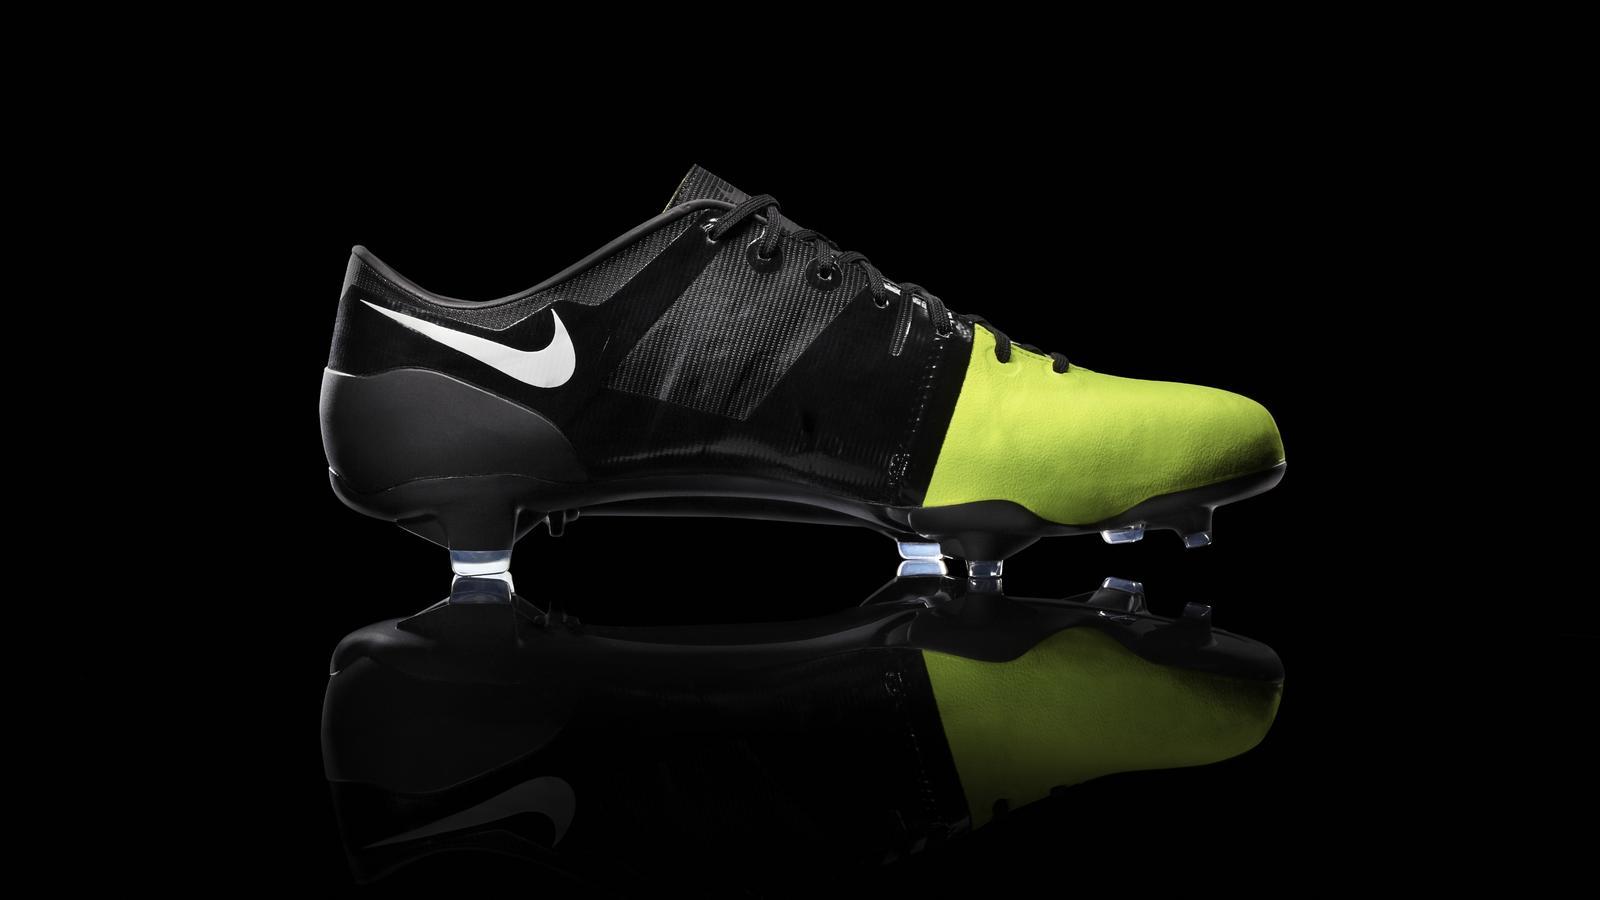 sale retailer quality design so cheap Brazil star Neymar goes green this summer - Nike News